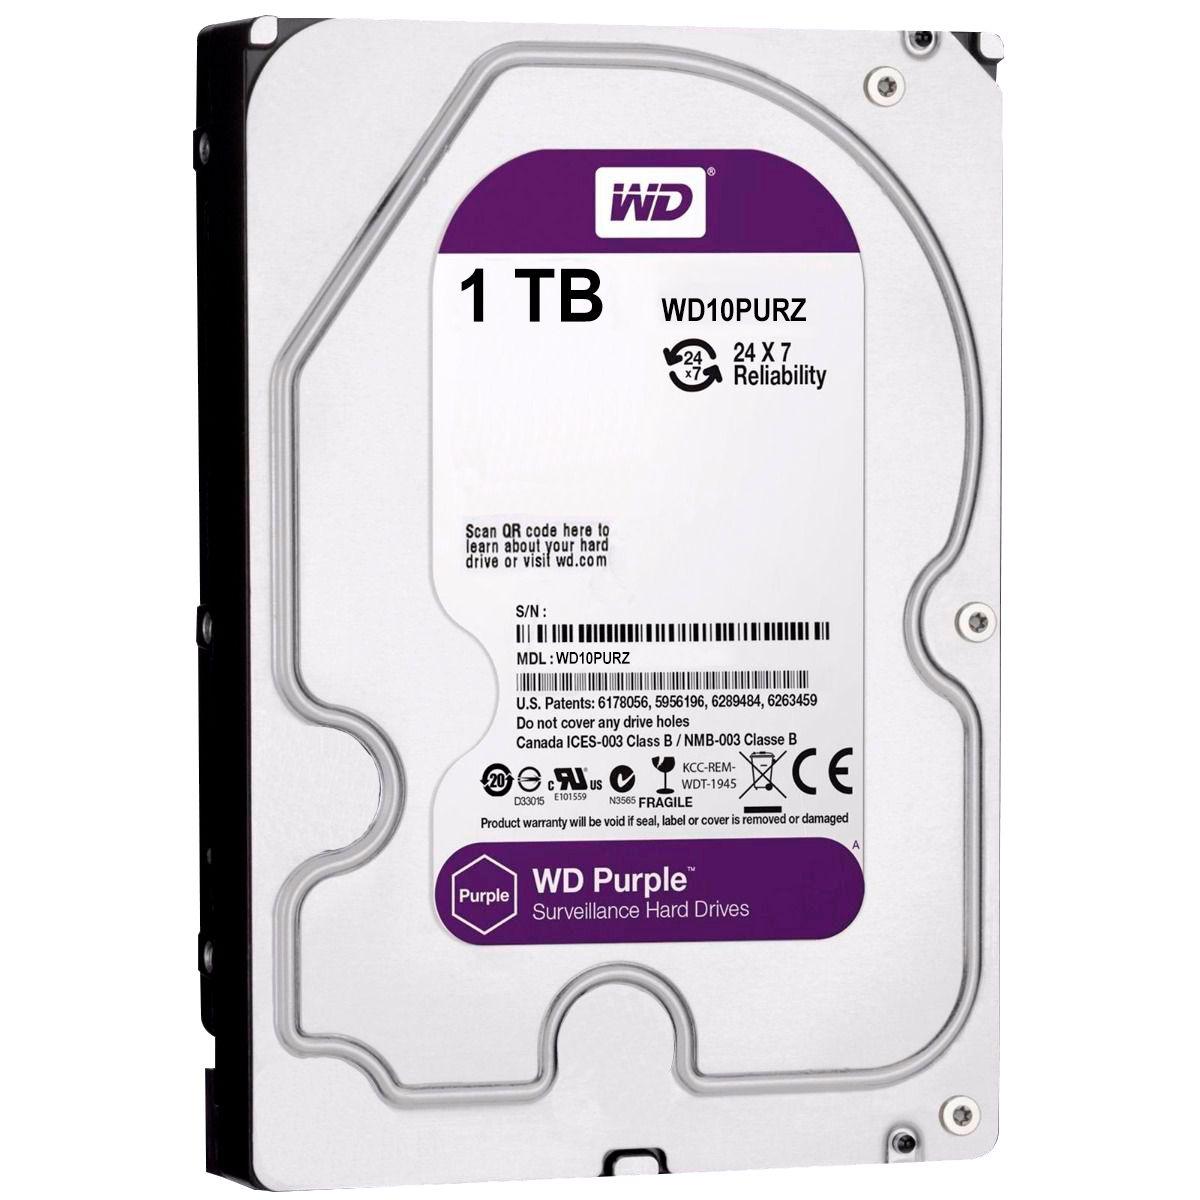 Kit 3 Câmeras de Segurança Full HD 1080p VHD 3230B G4 + DVR Intelbras Full HD + HD WD Purple 1TB + Acessórios  - Tudo Forte